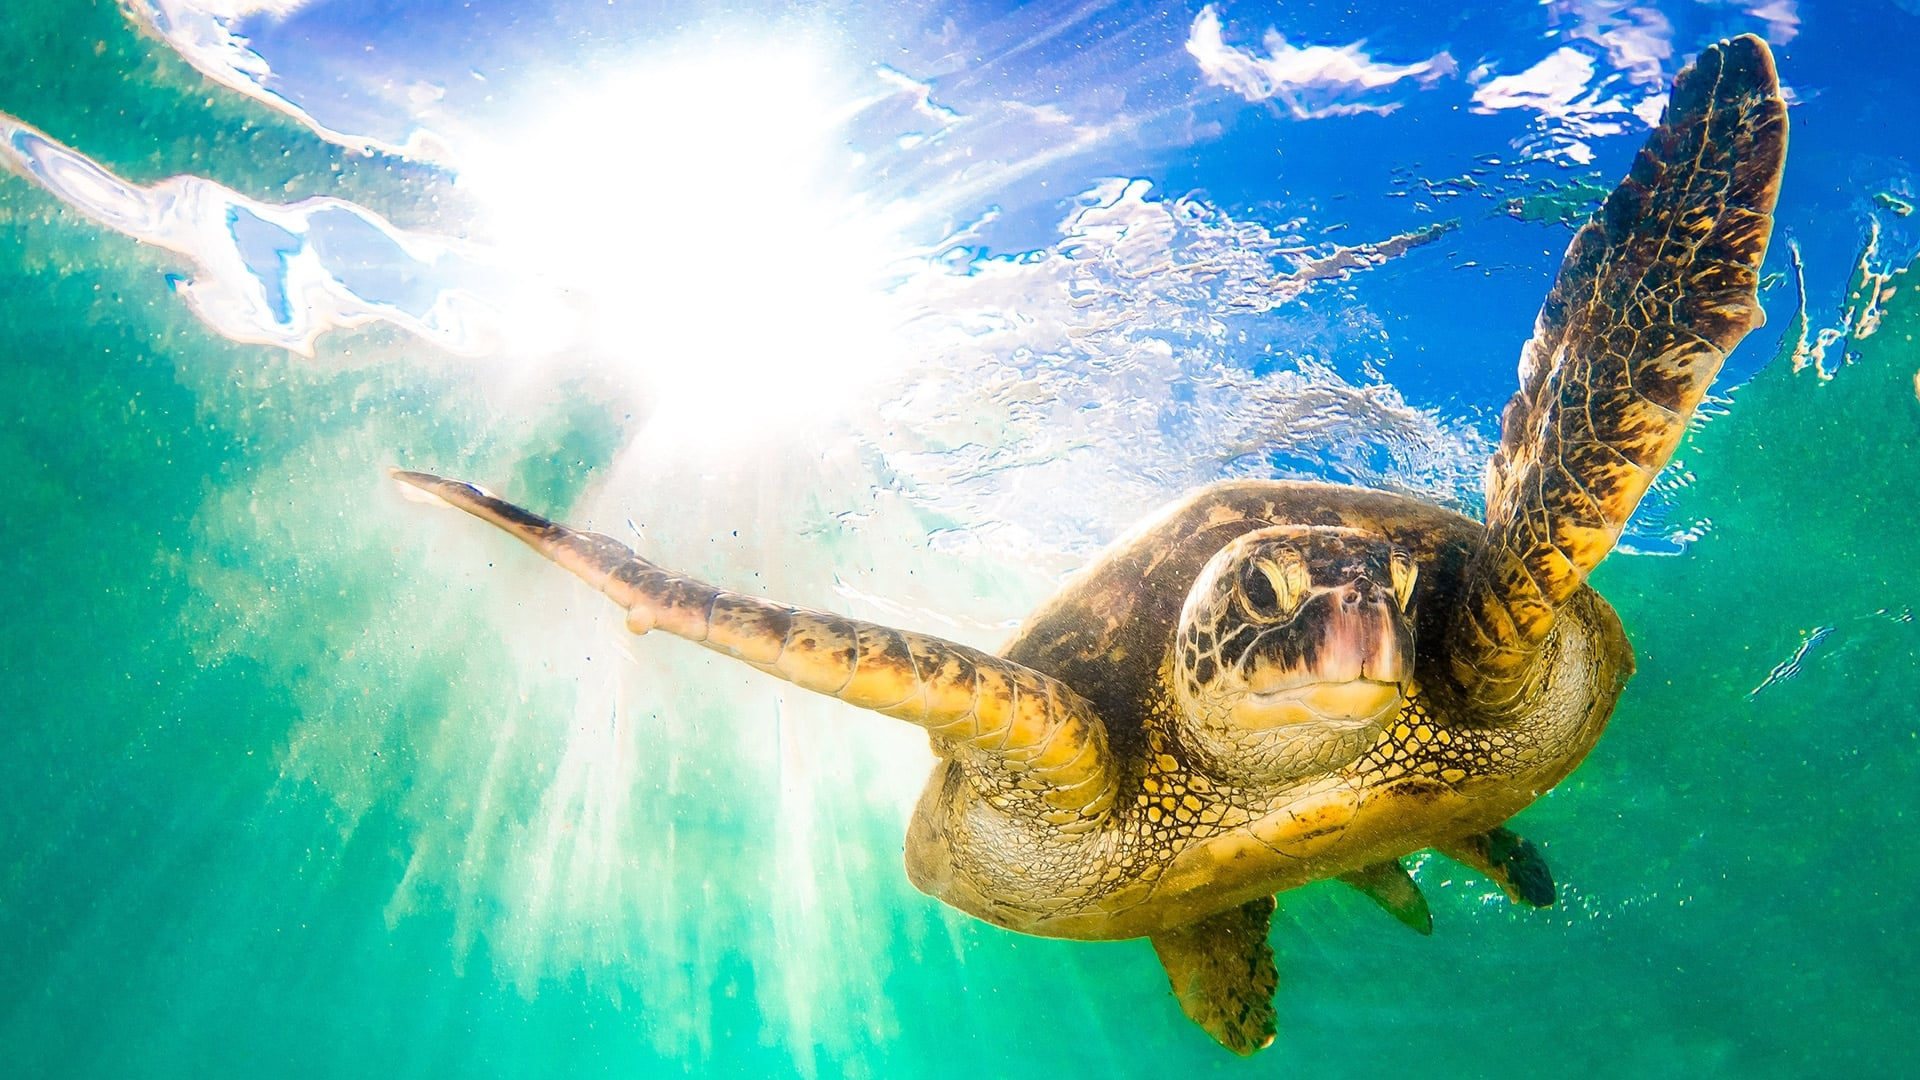 Download Earths.Tropical.Islands.S01E03.Hawaii.1080p.HDTV